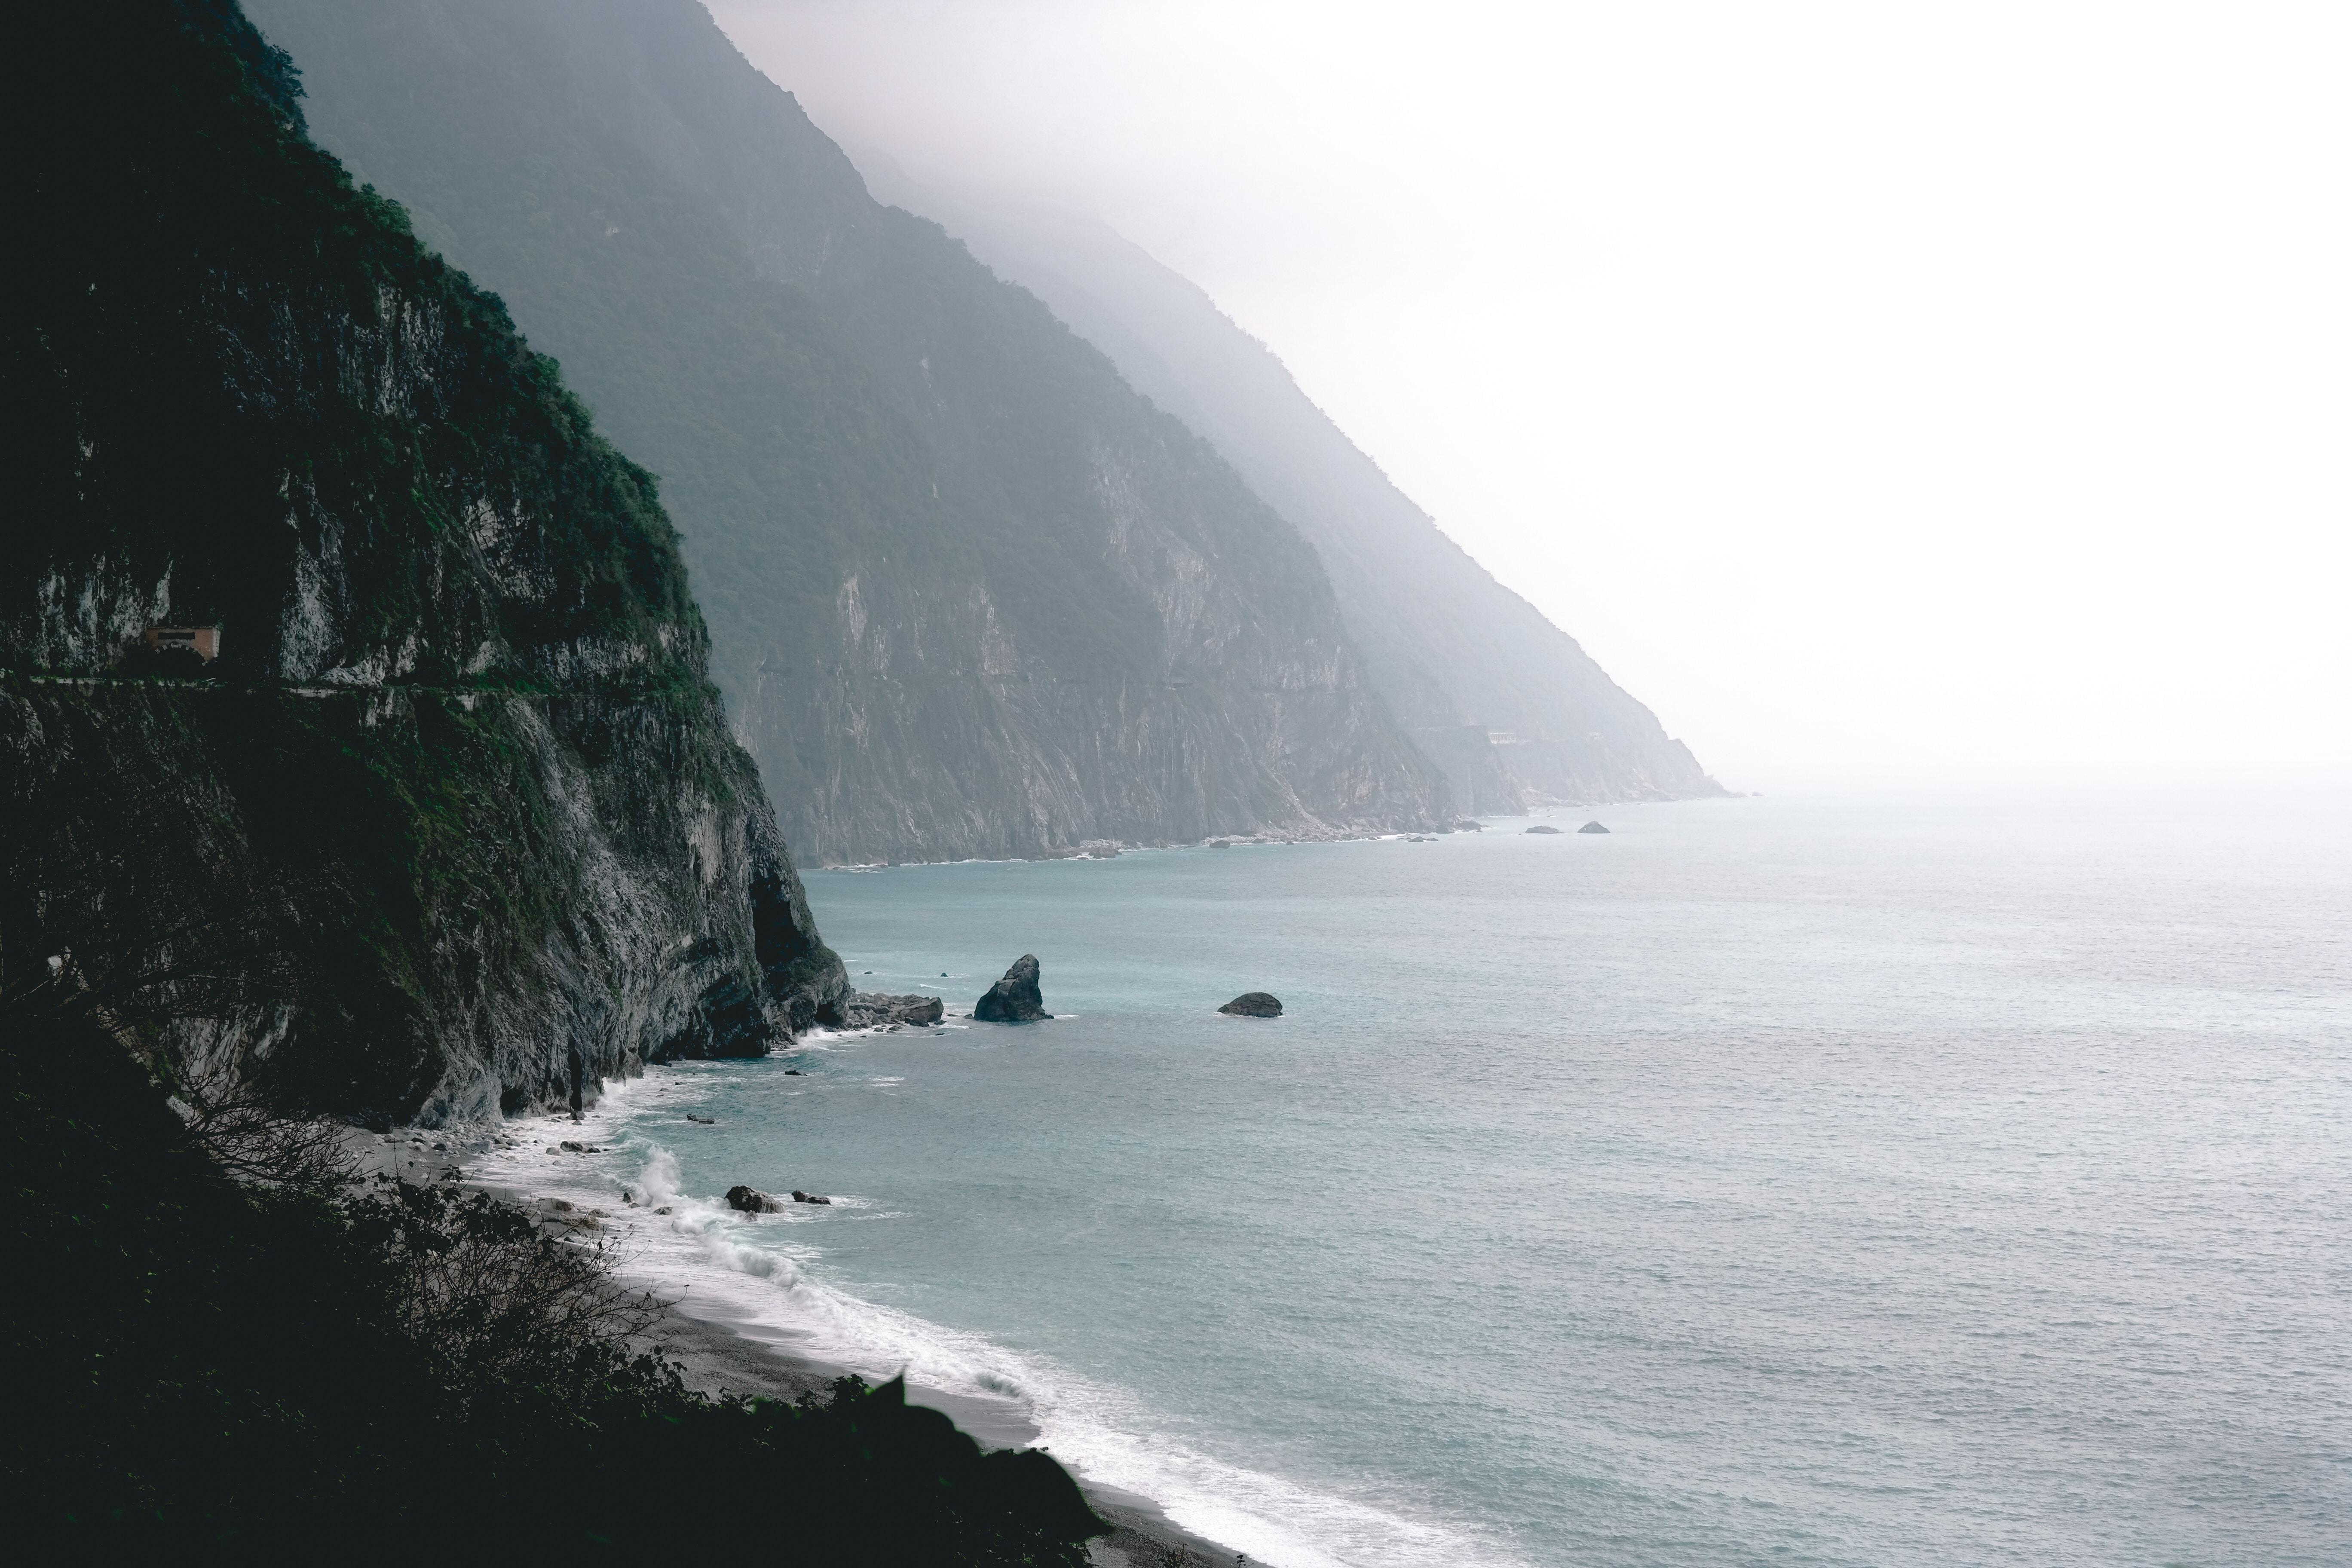 landscape of seashore near mountain